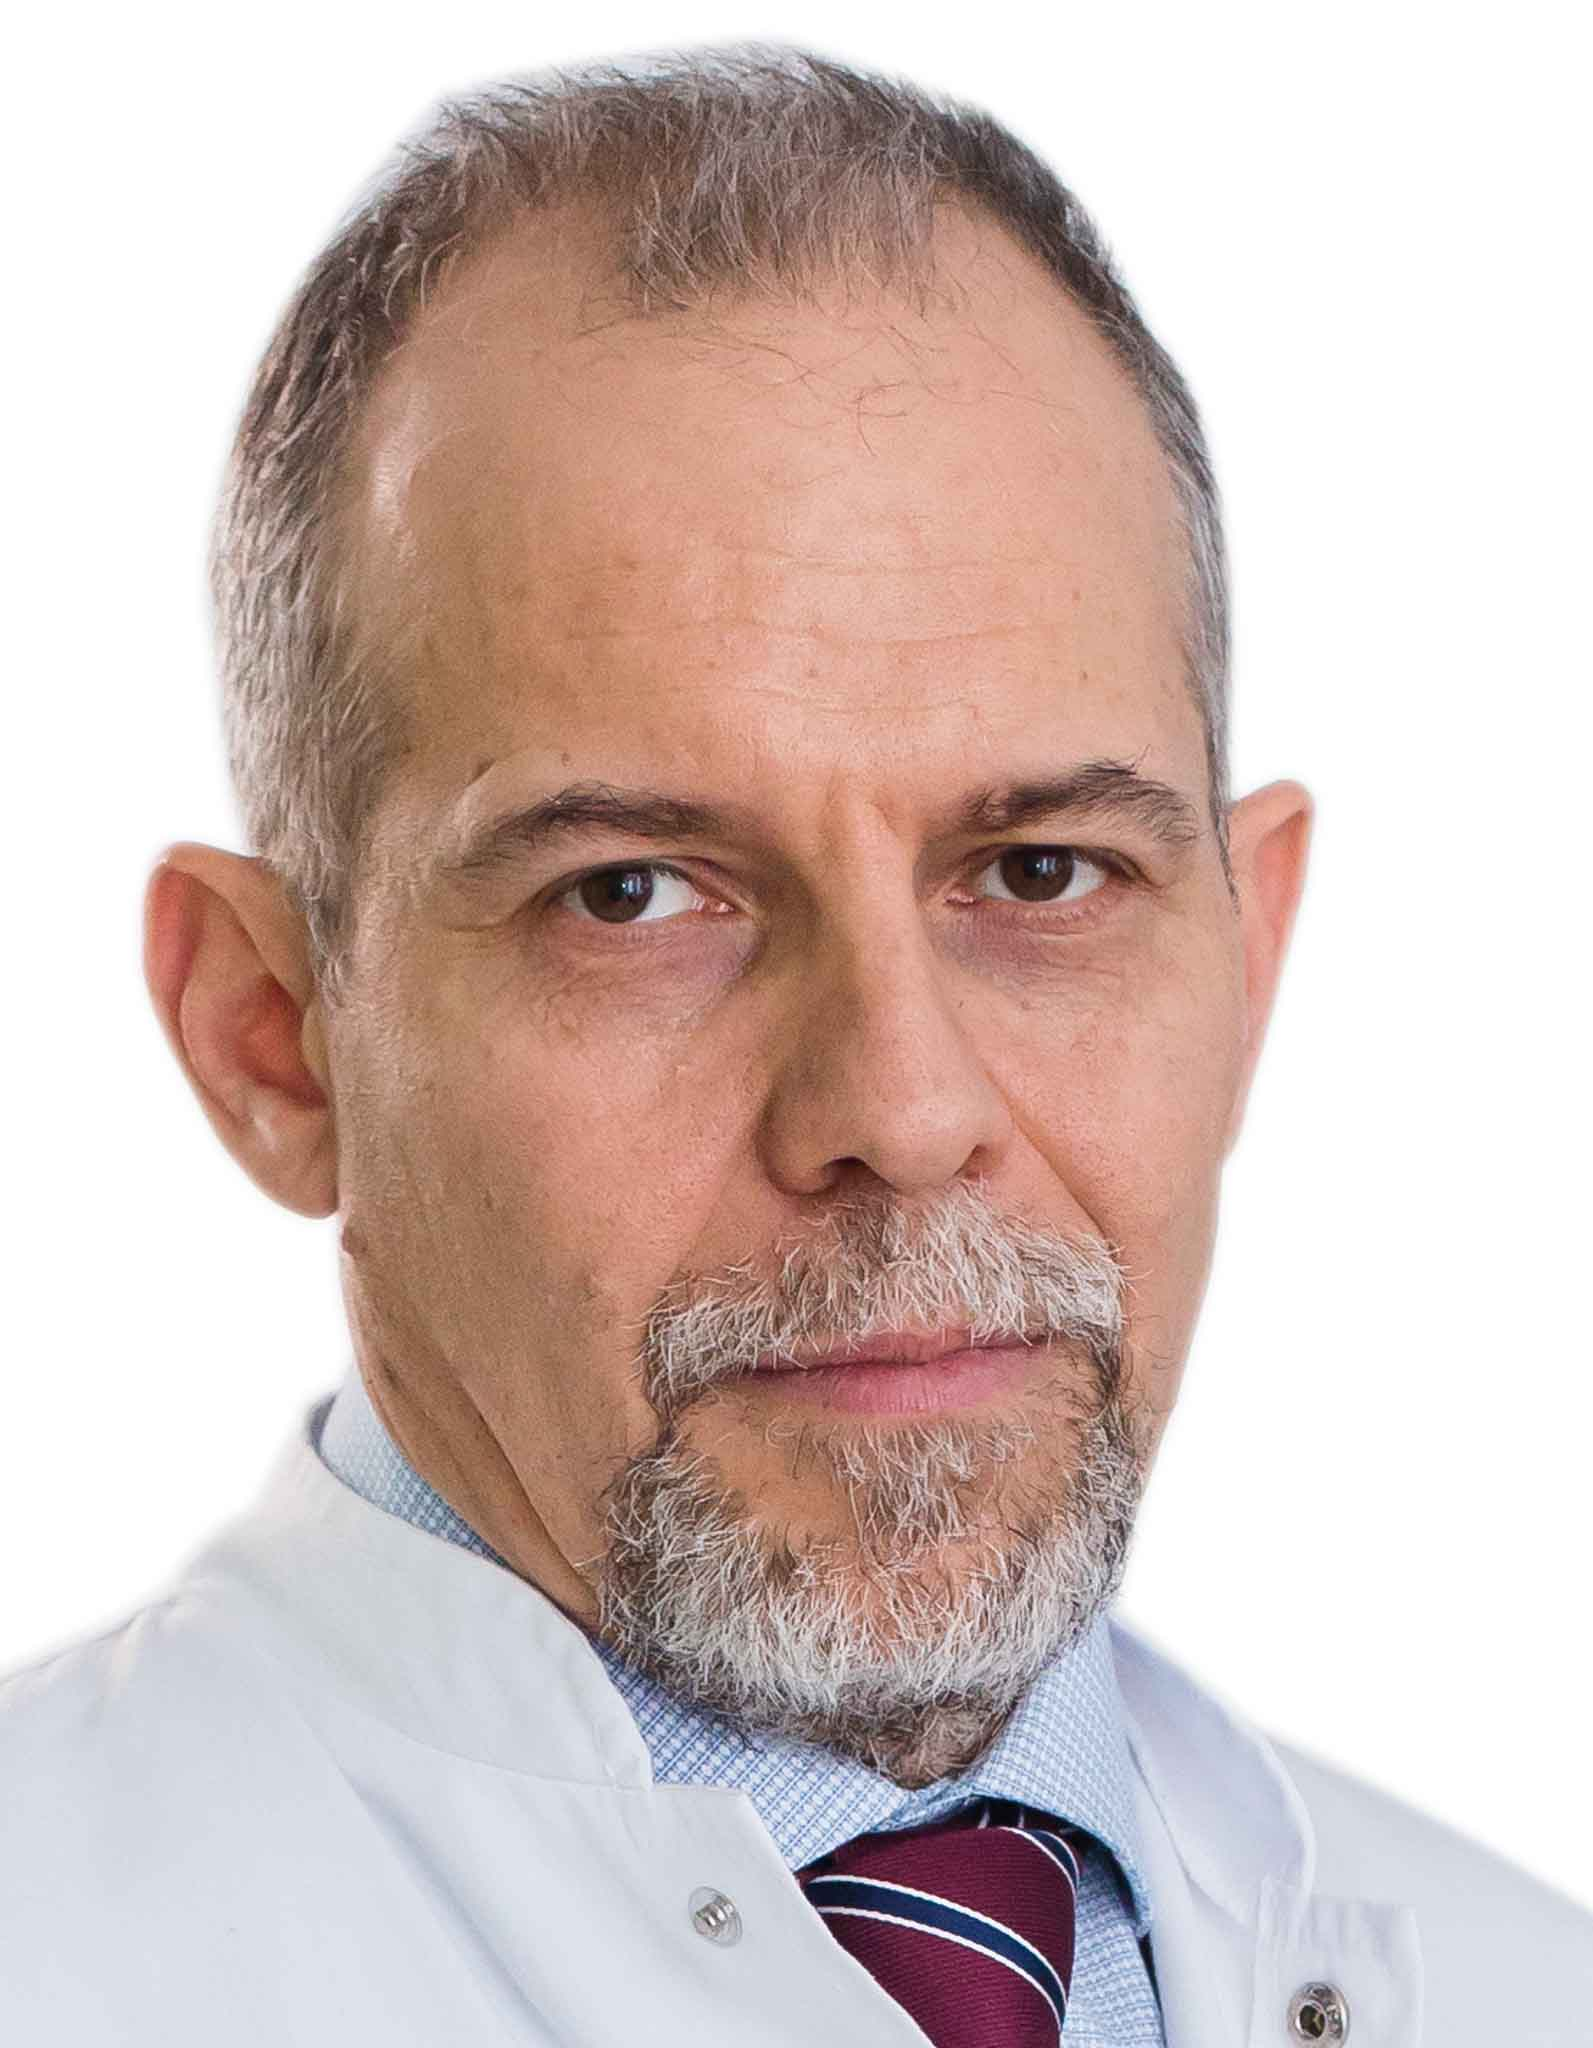 Dr. Antoniu Cringu-Ionescu